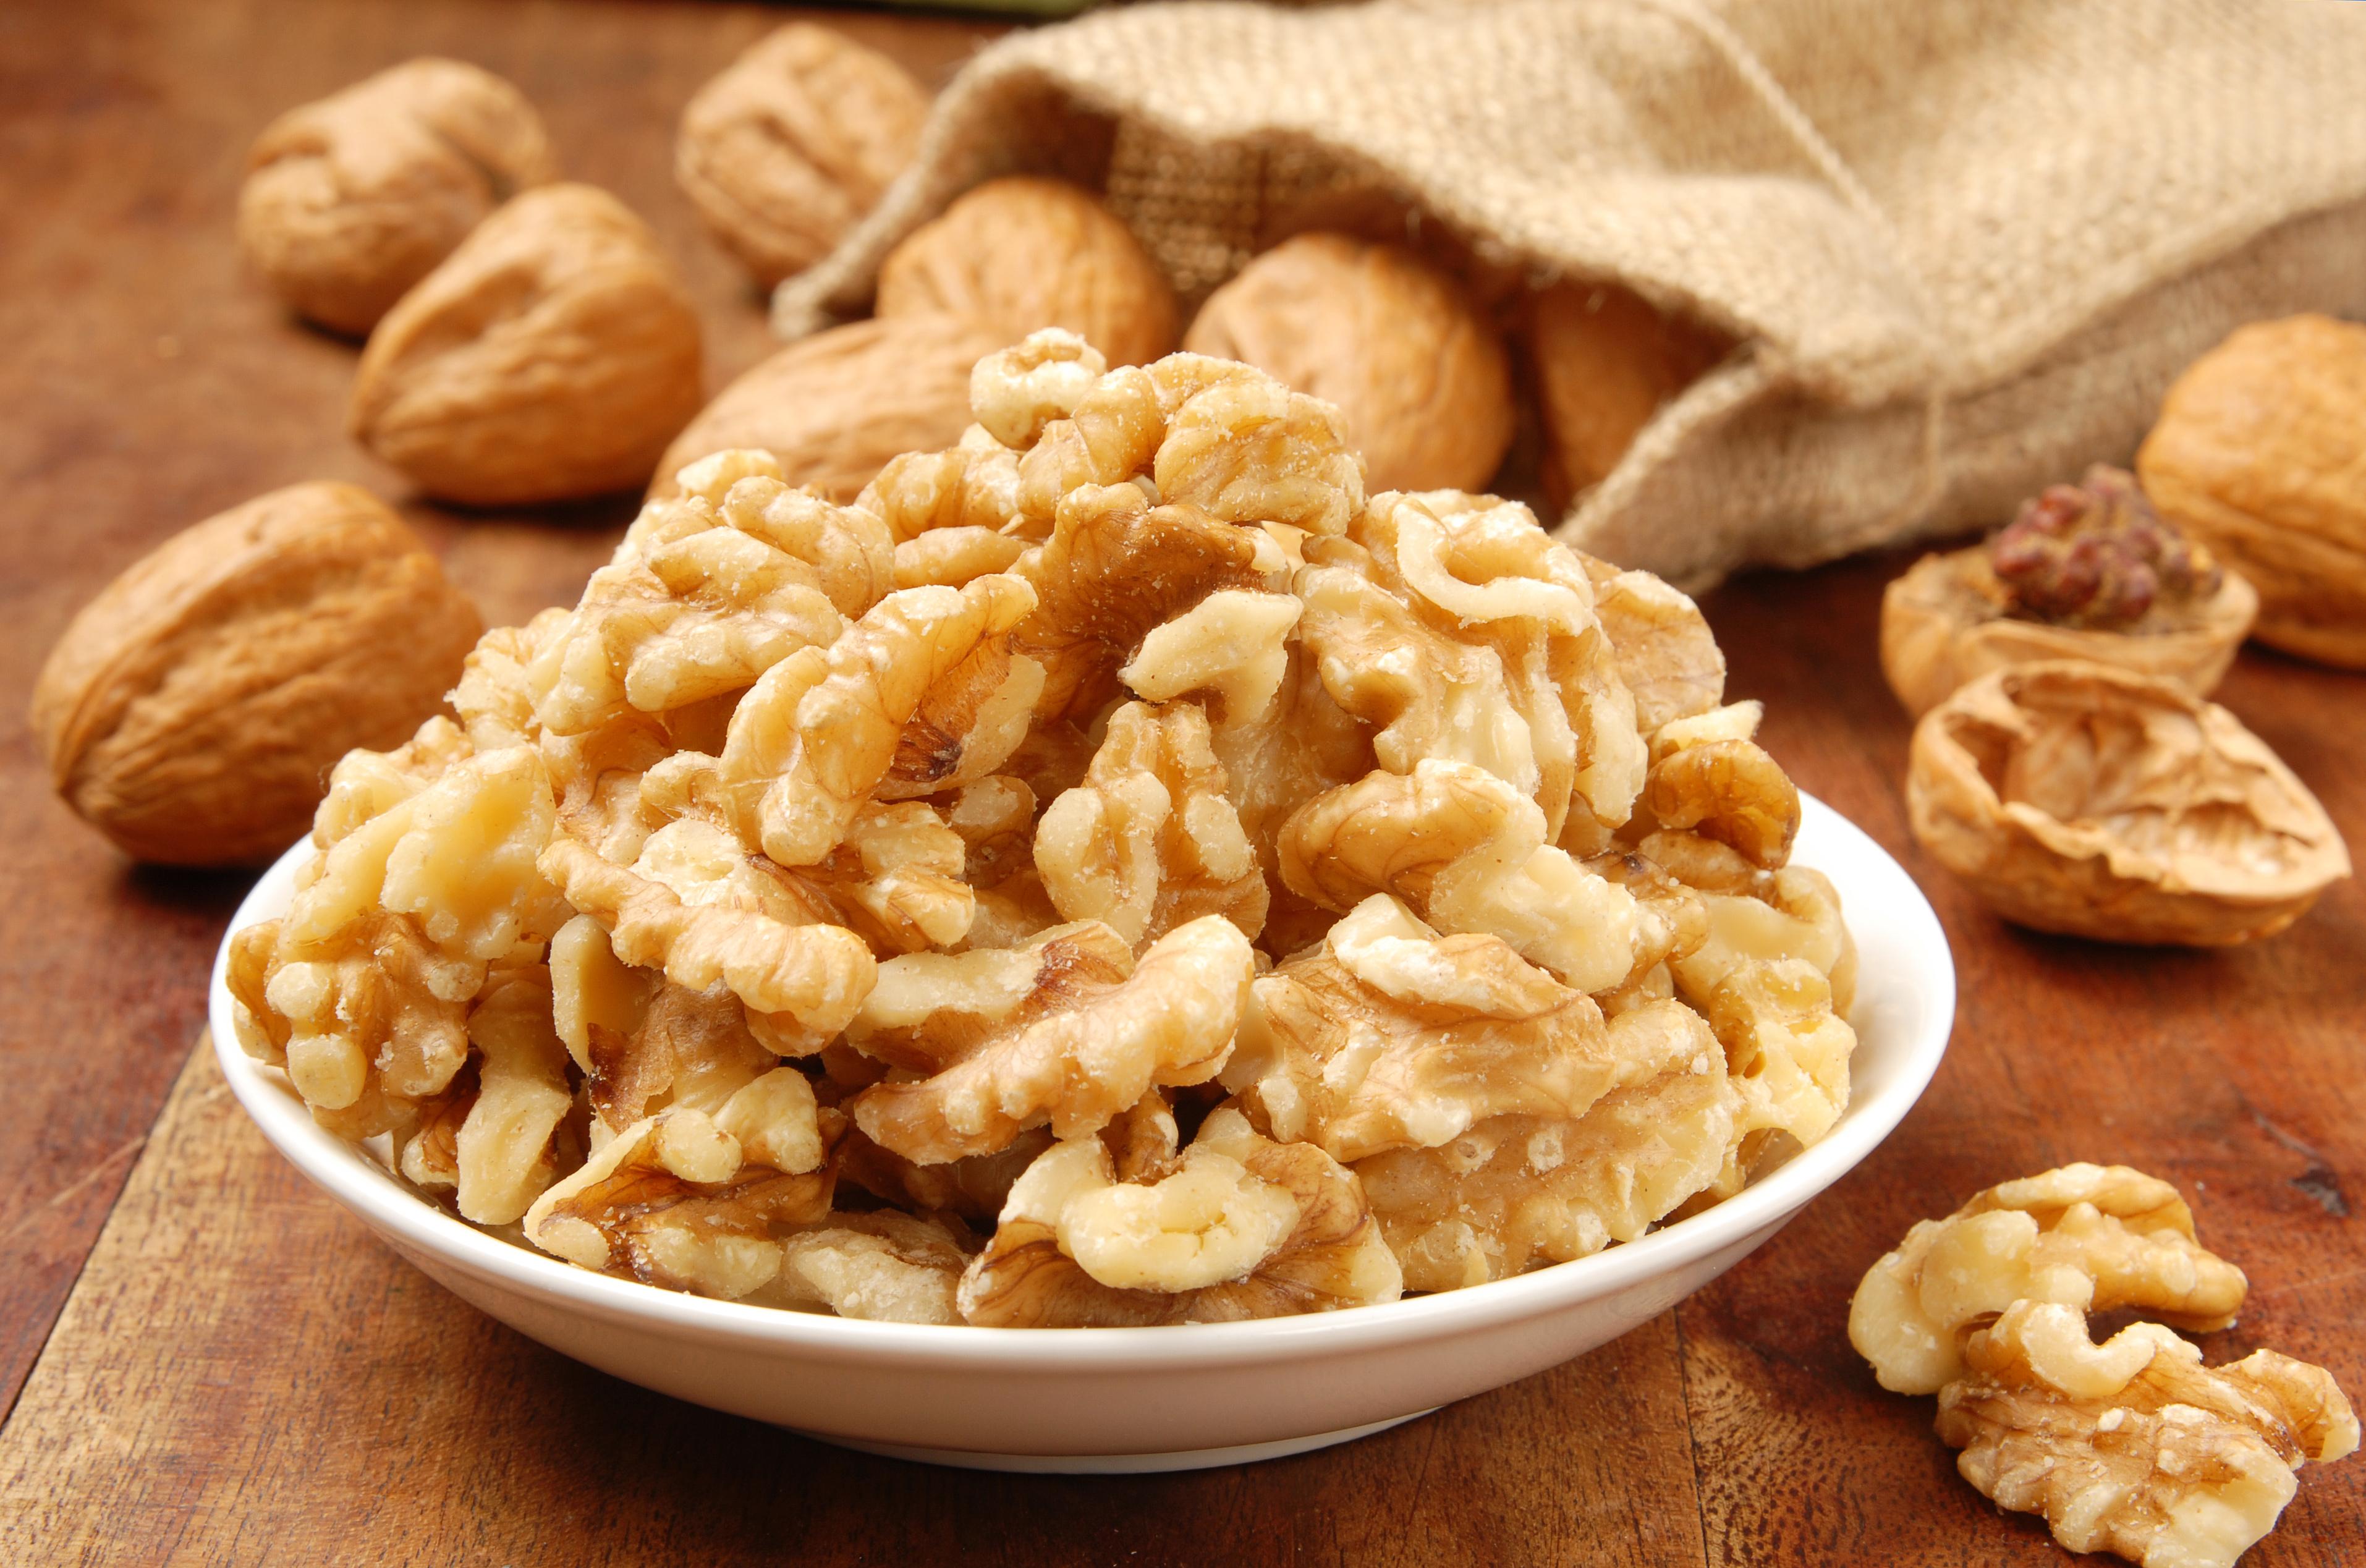 Walnut Protein Rapid Test